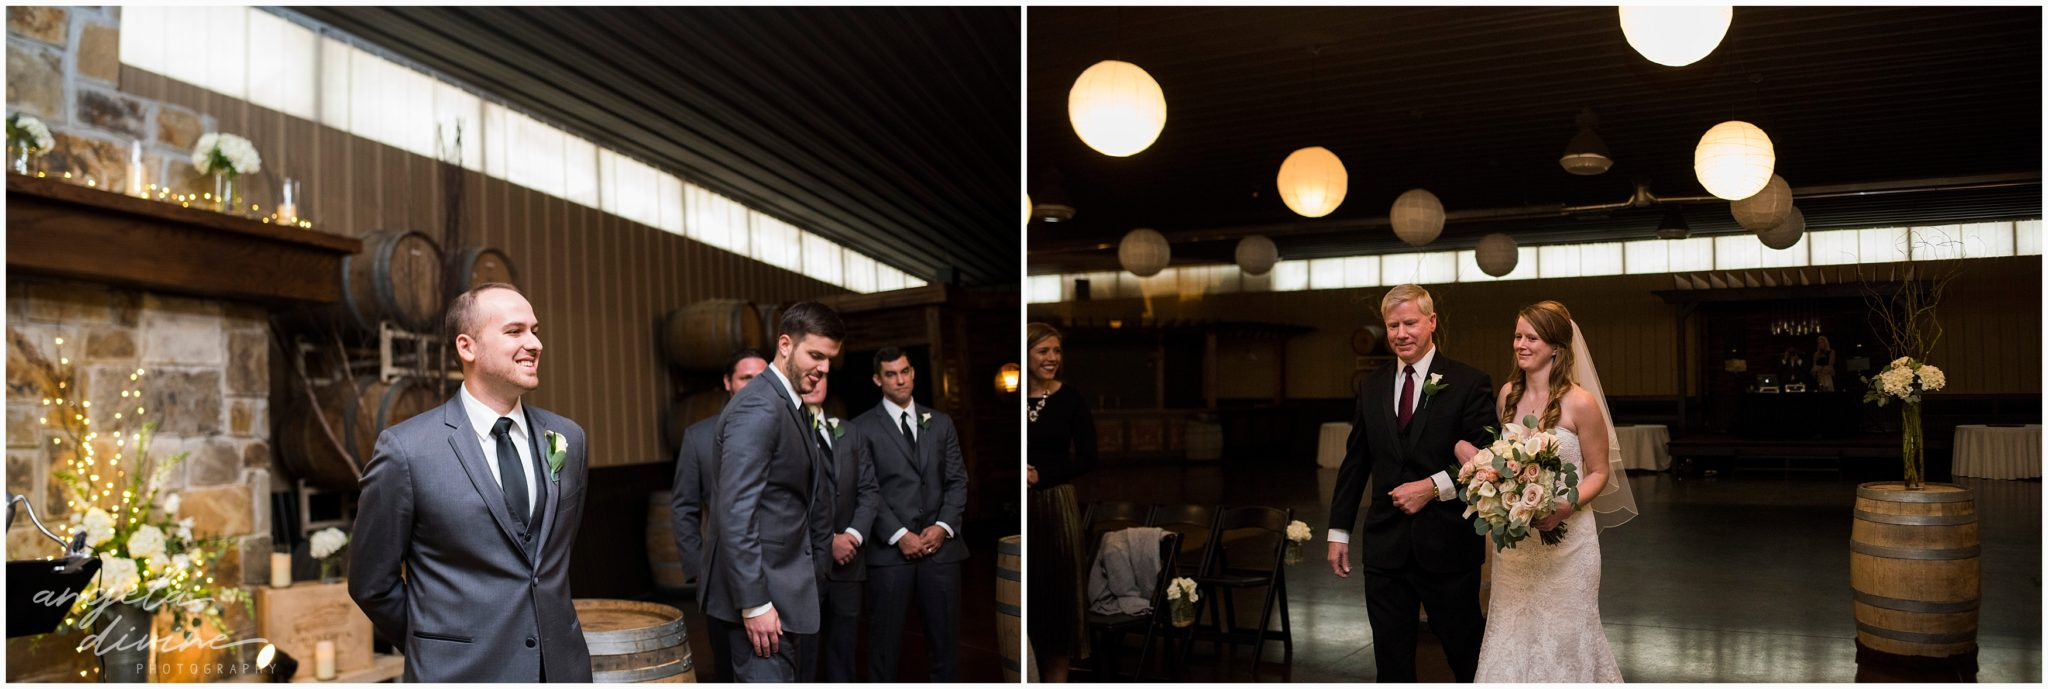 Carlos Creek Winery Wedding Ceremony Aisle